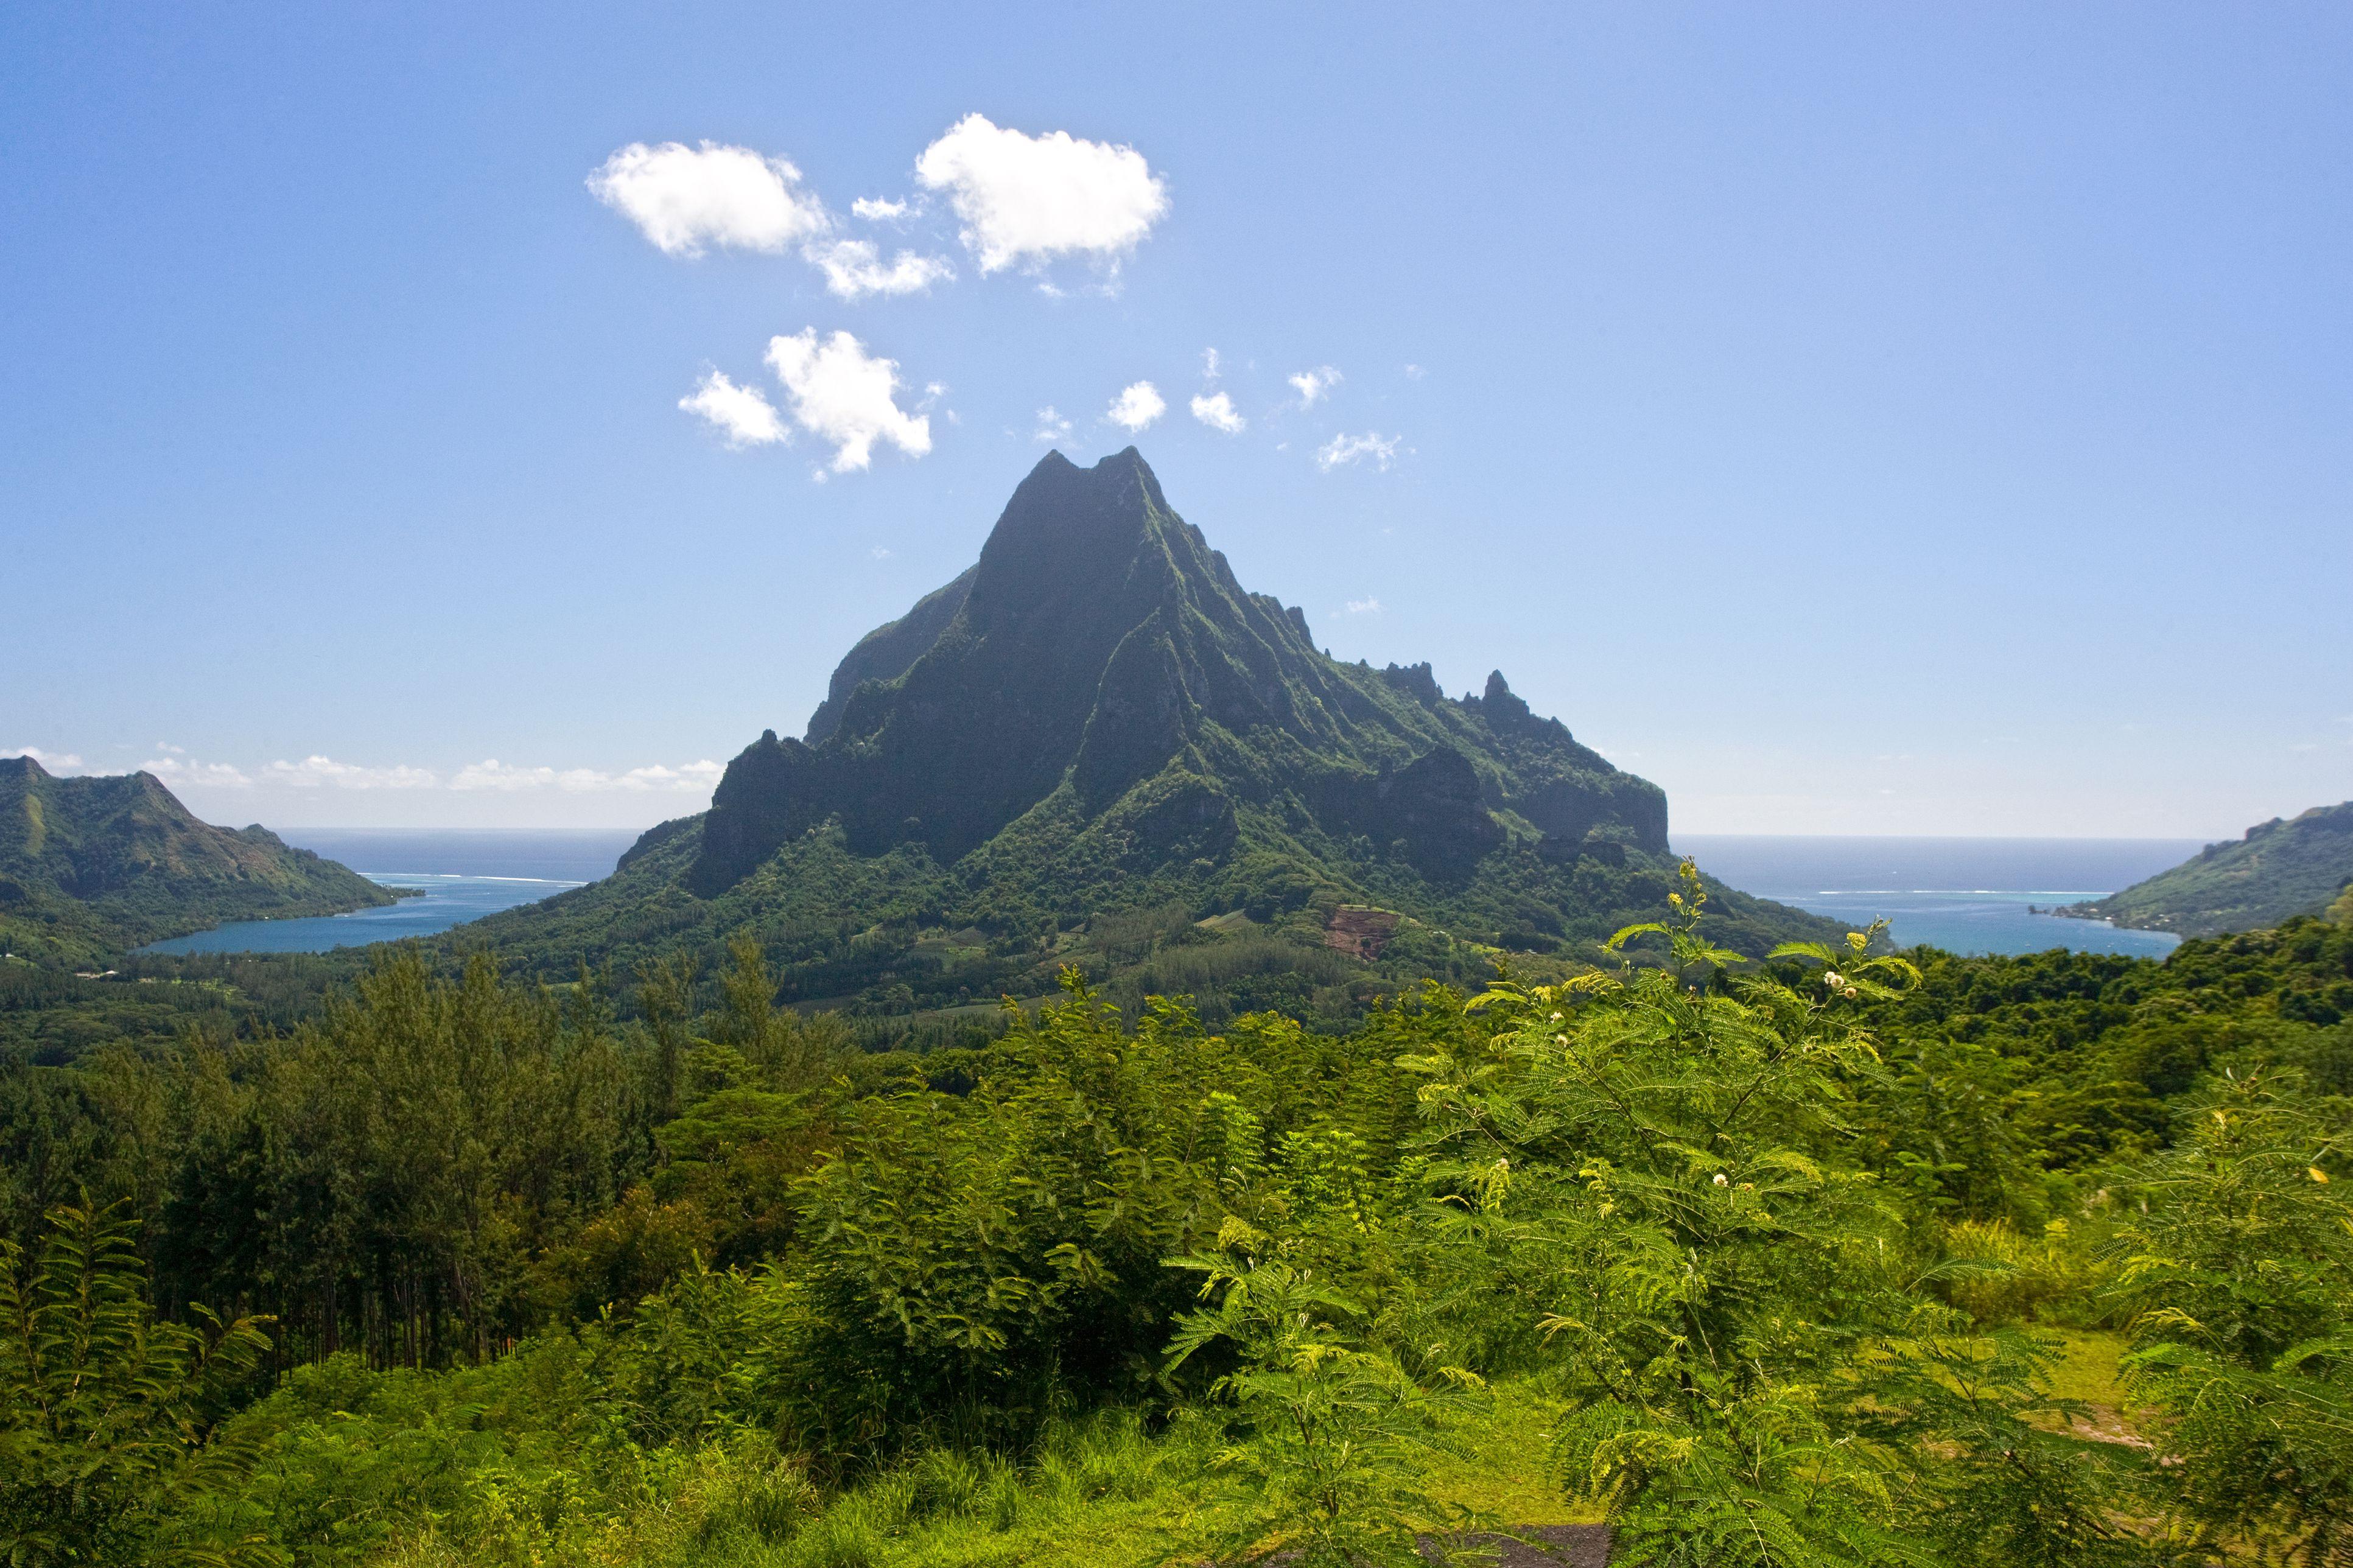 Tropical island moorea scenic, Tahiti